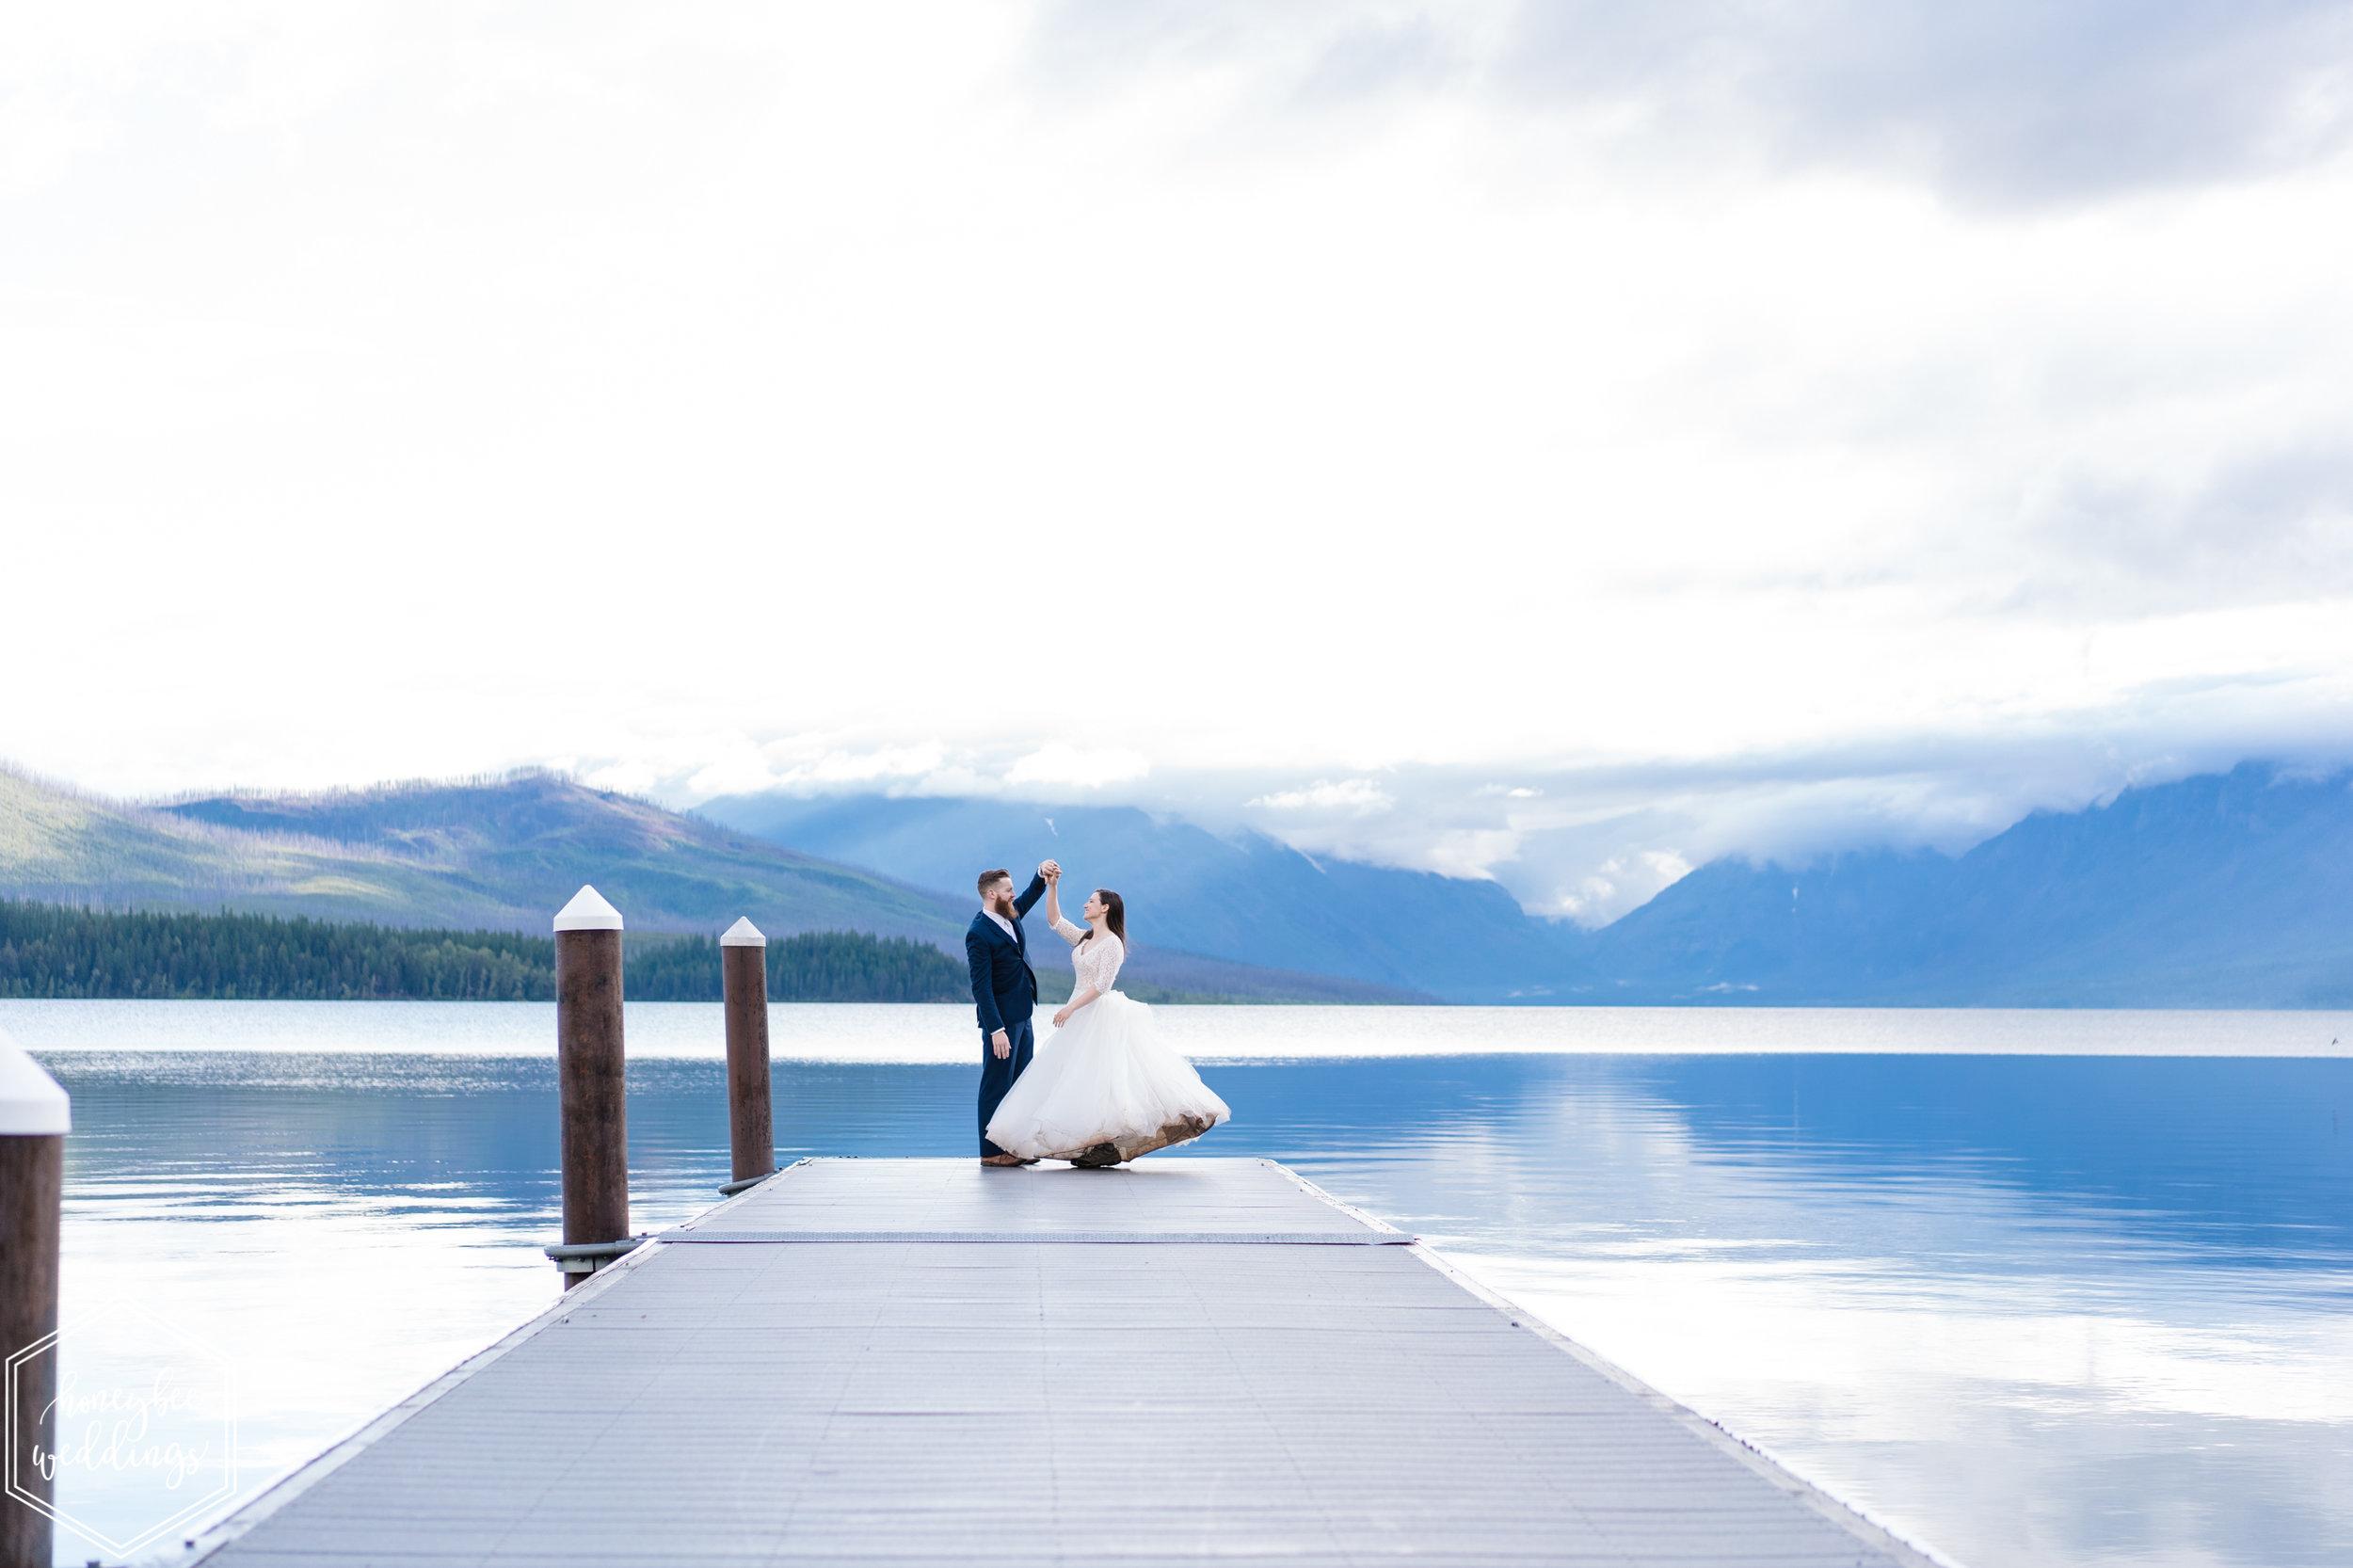 220Glacier National Park Wedding_Izaak Walton Inn Wedding_Honeybee Weddings_Norah & Kyle_June 09, 2019-33.jpg